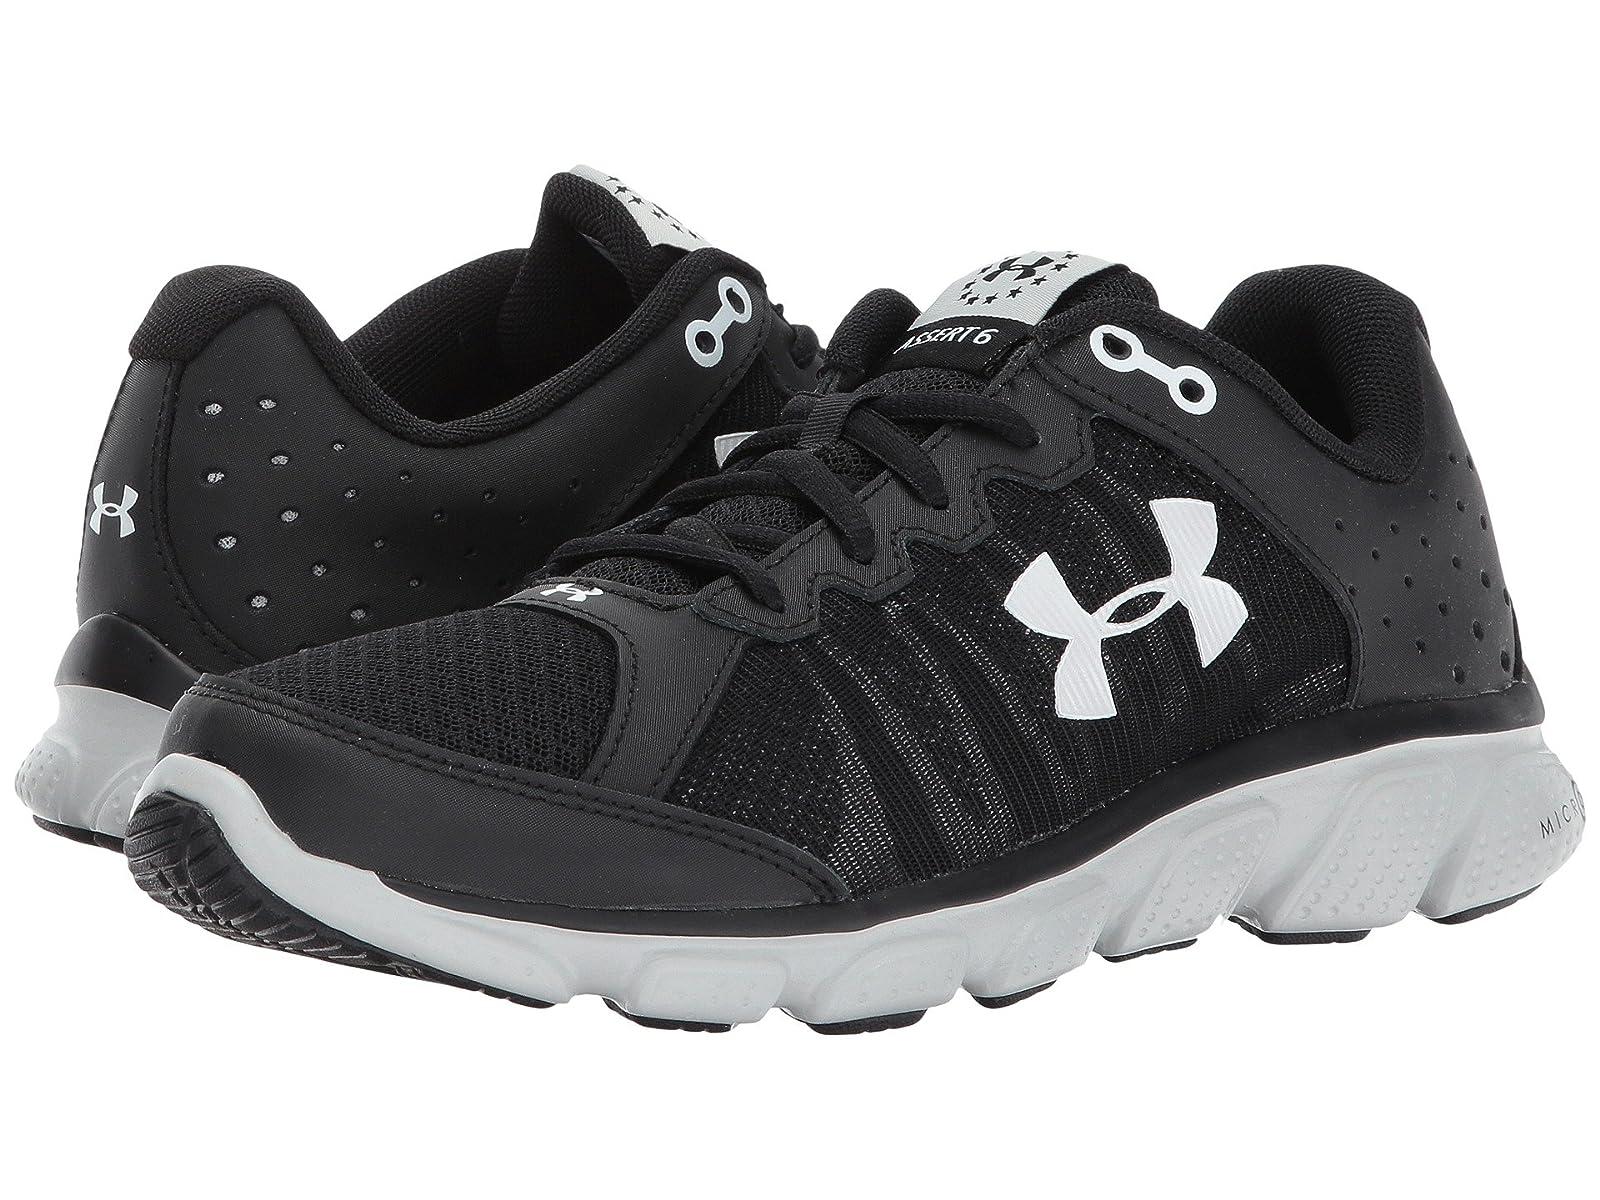 Under Armour UA Freedom Assert VIAtmospheric grades have affordable shoes